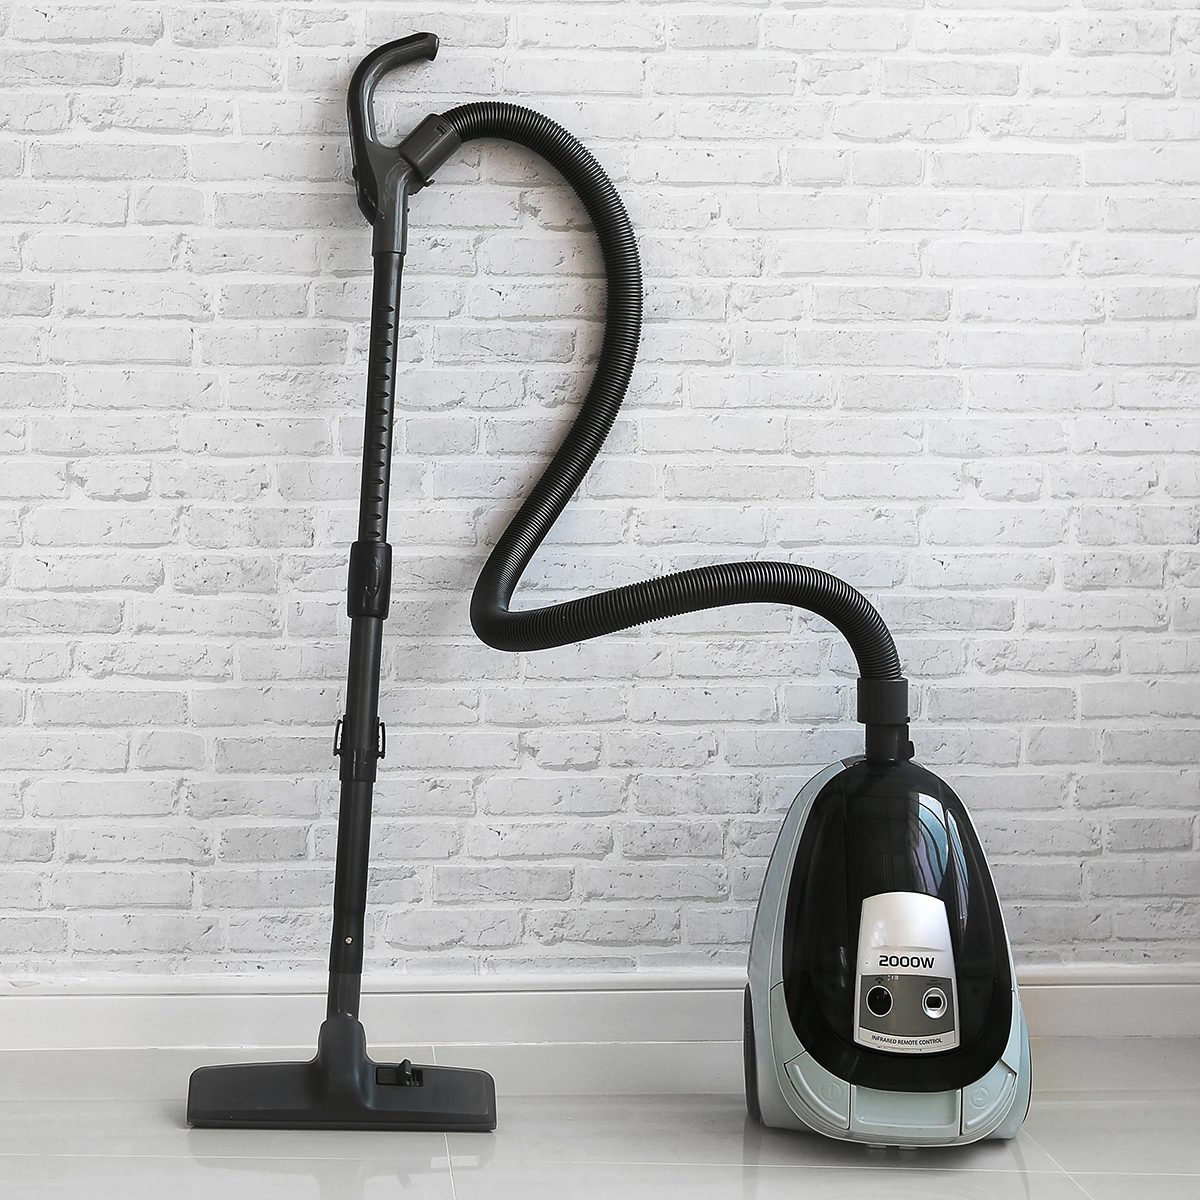 Vacuum cleaner against concrete wall